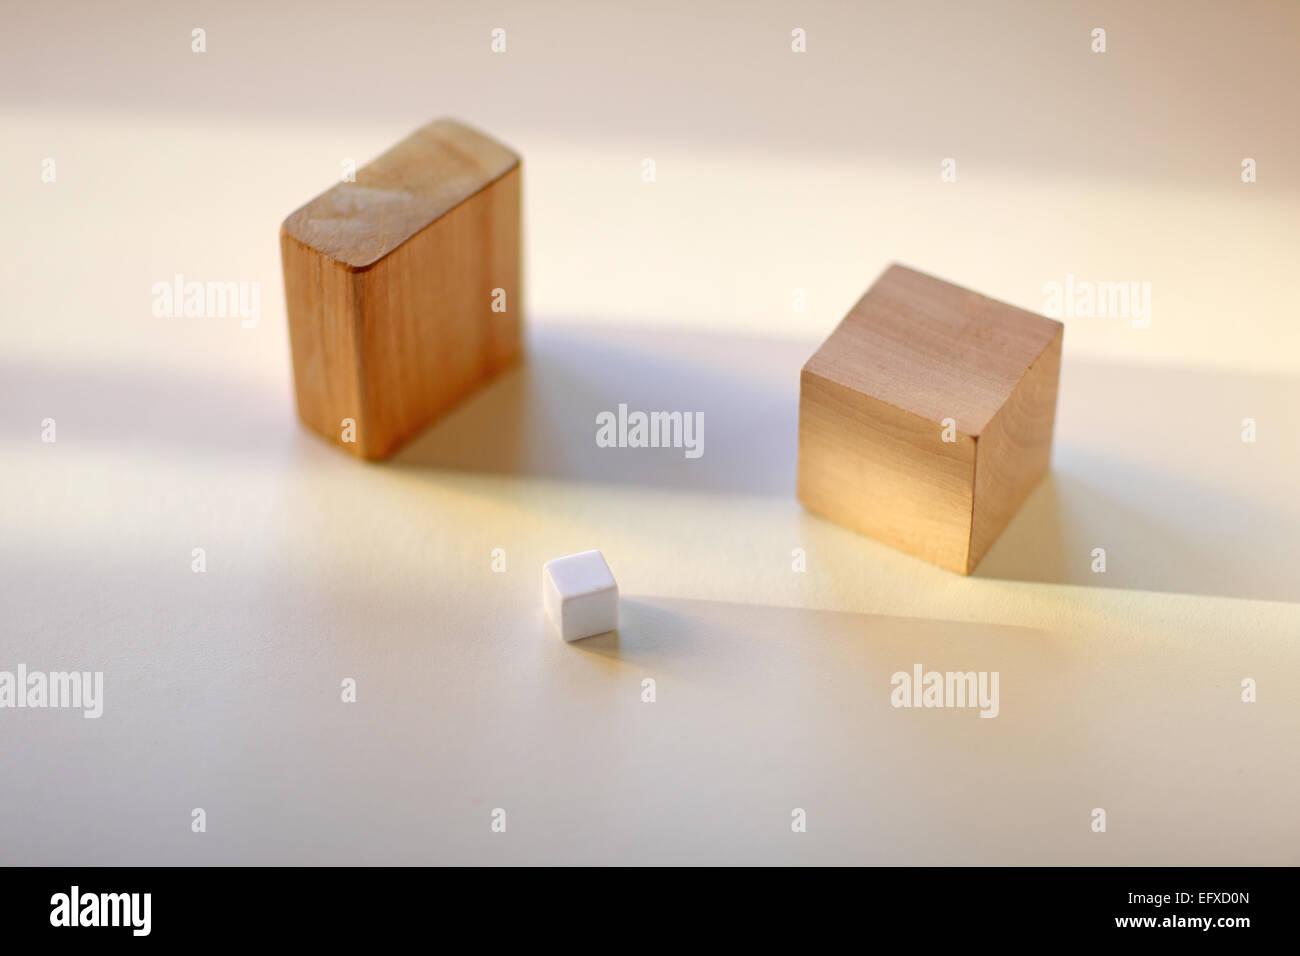 three blocks and cubes - Stock Image